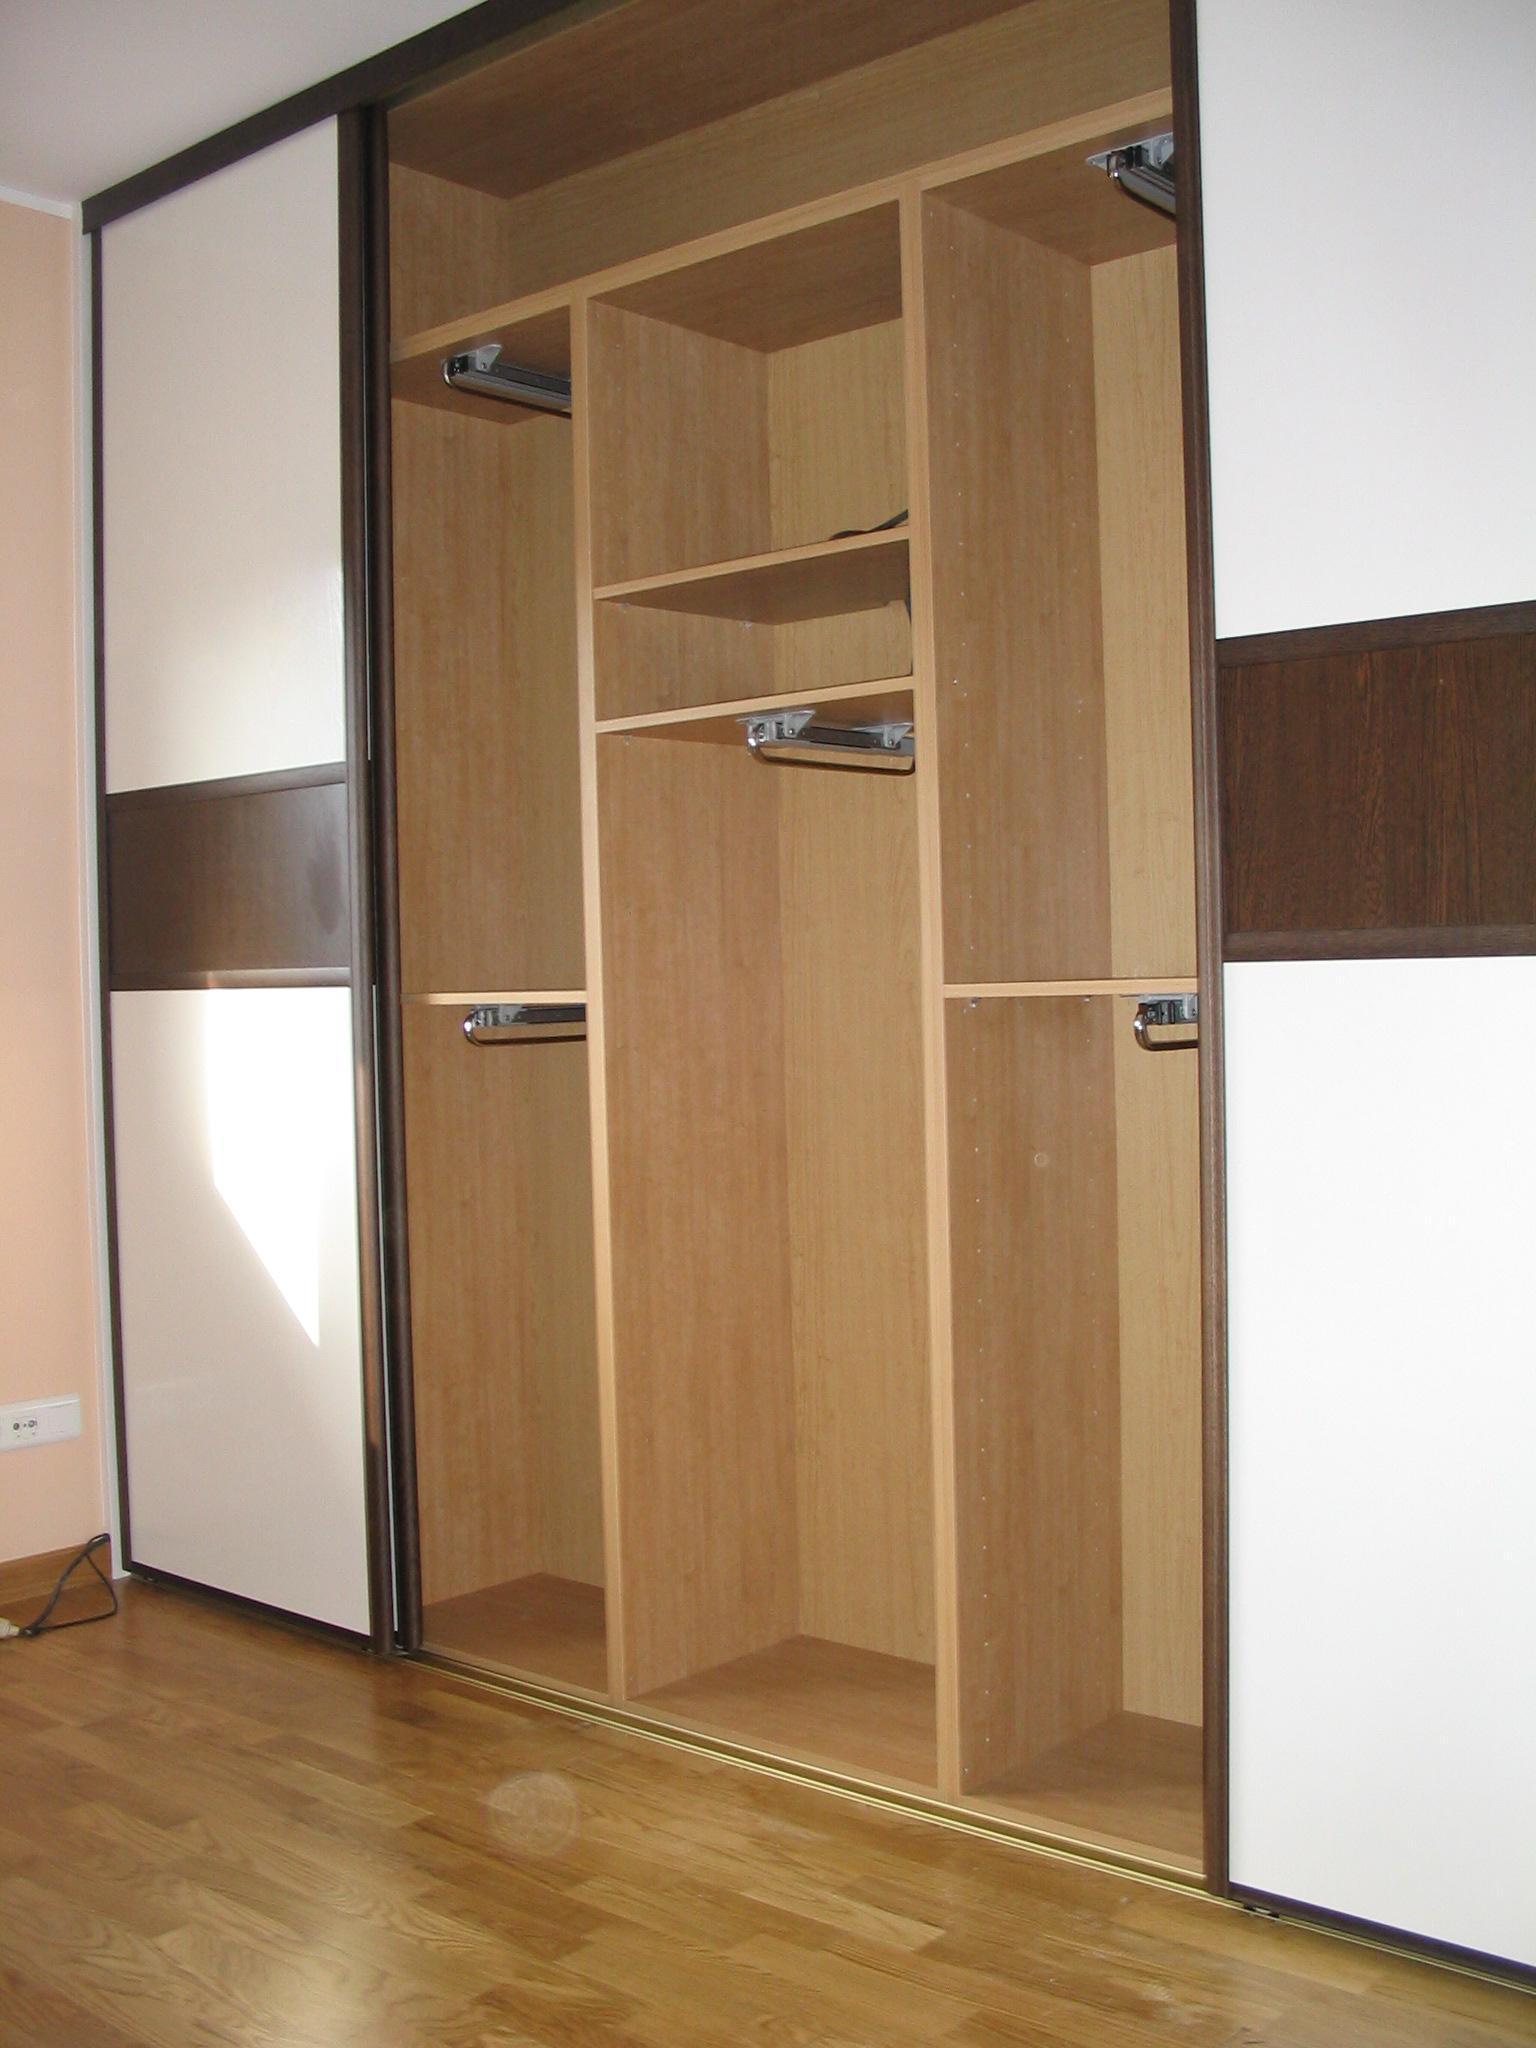 Armarios empotrados con puertas correderas o abatibles - Puertas correderas armario empotrado ...